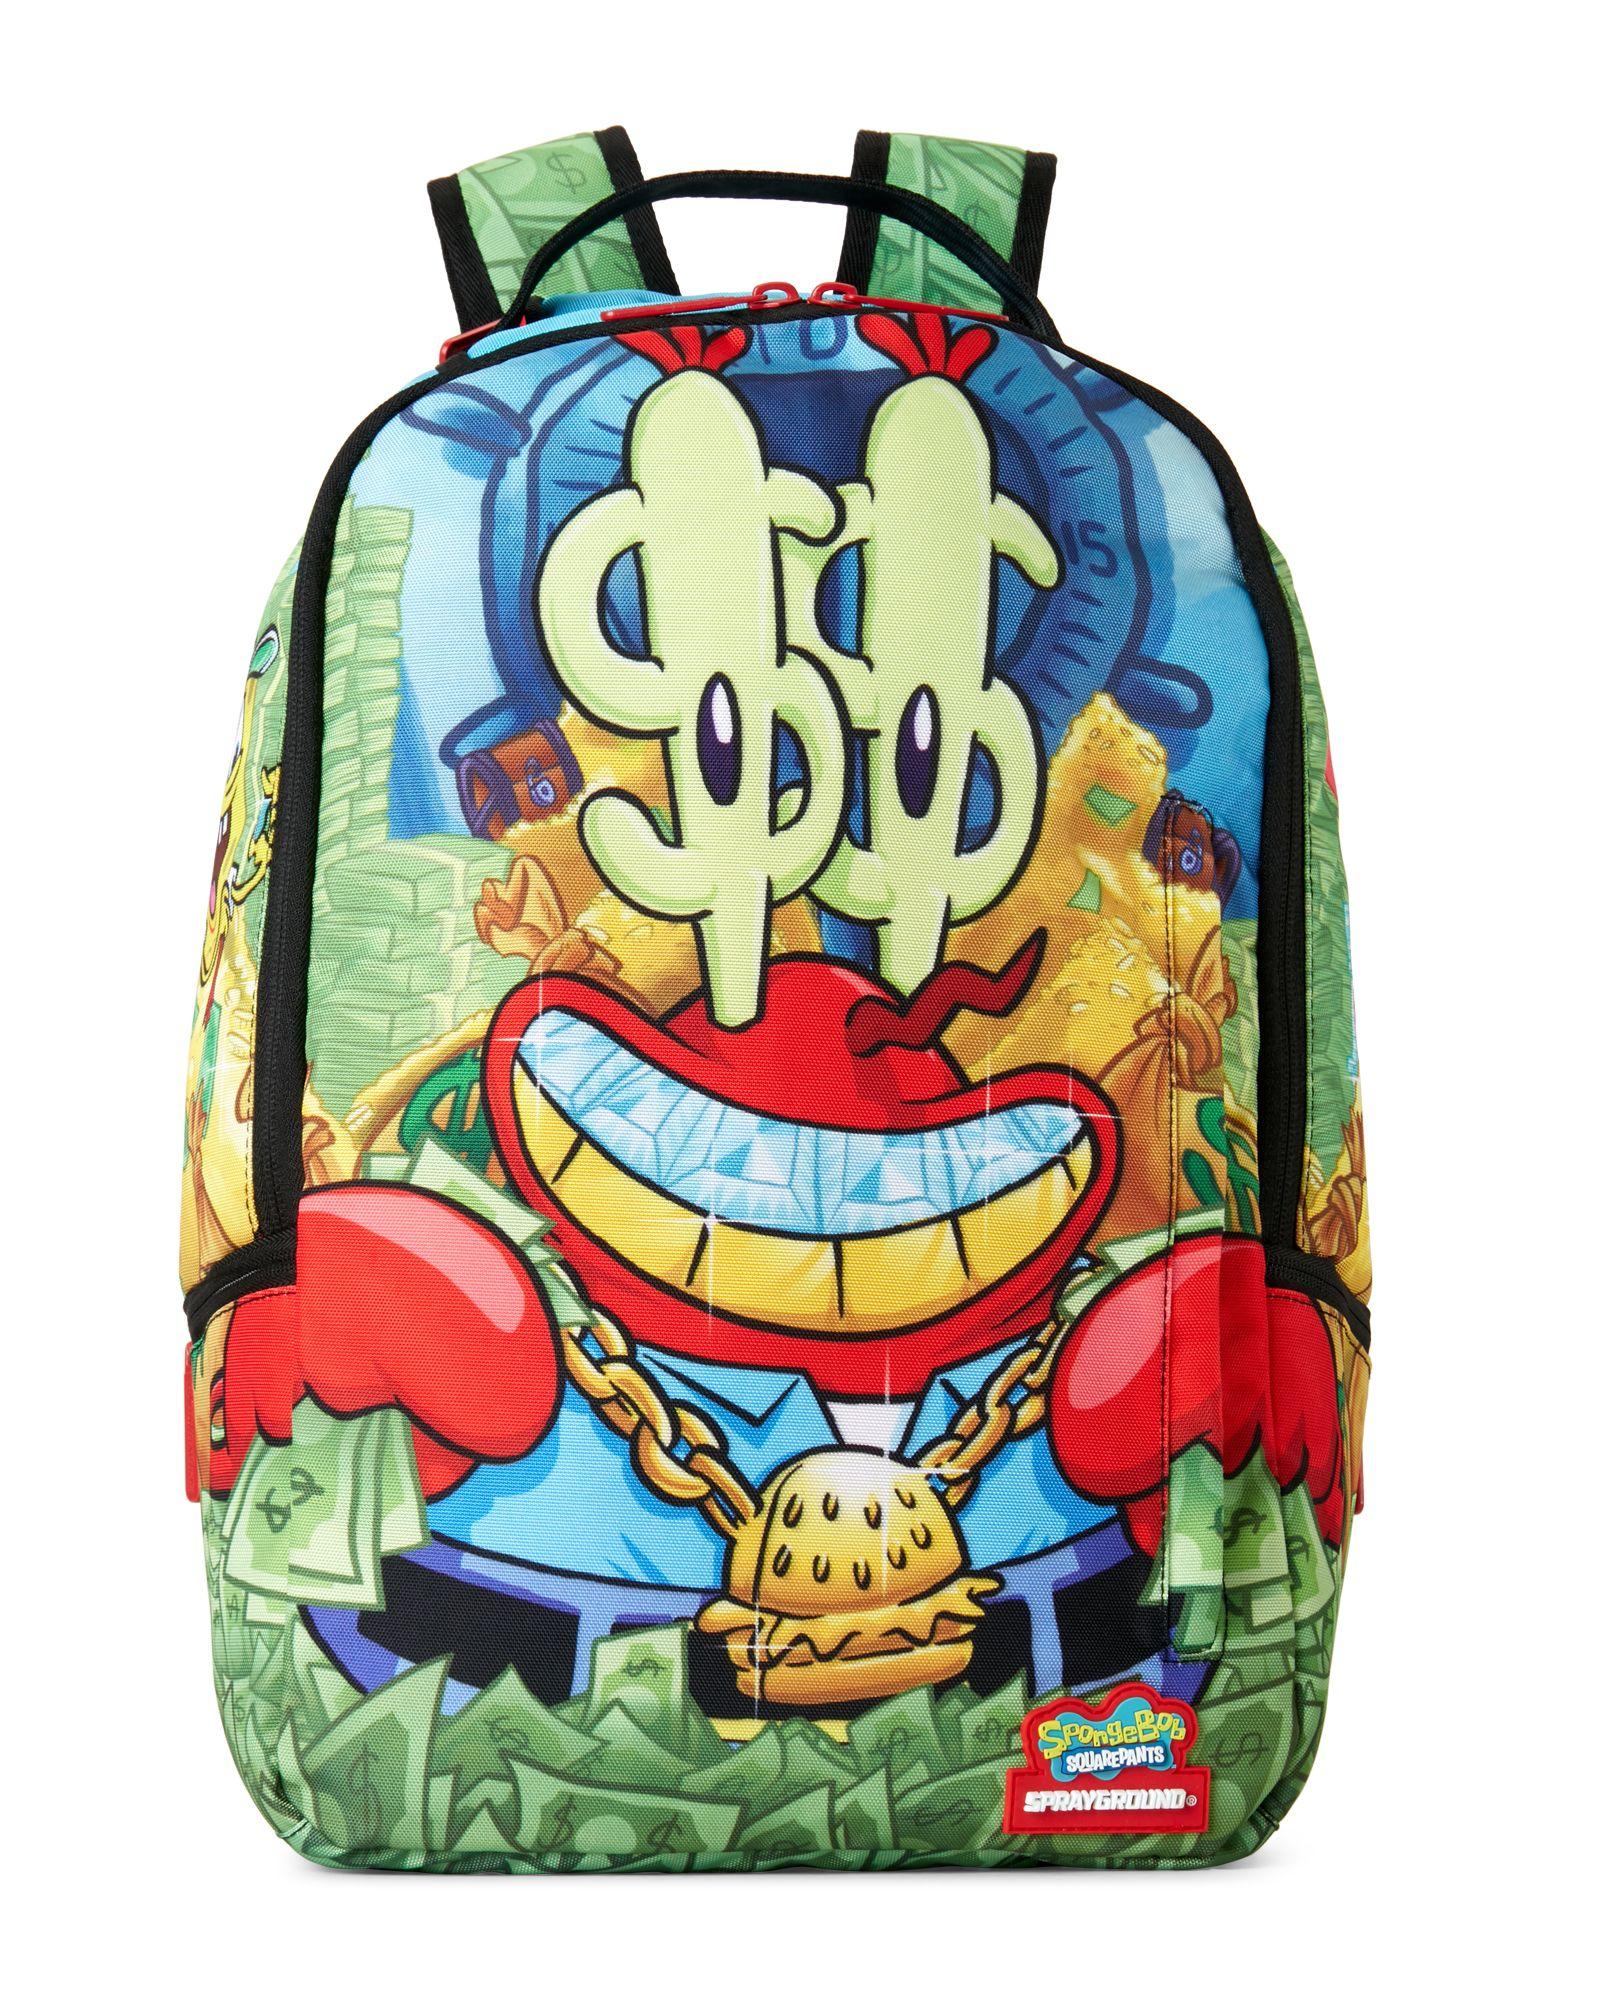 22faeaa8ee3f Sprayground Spongebob Money Krab Backpack